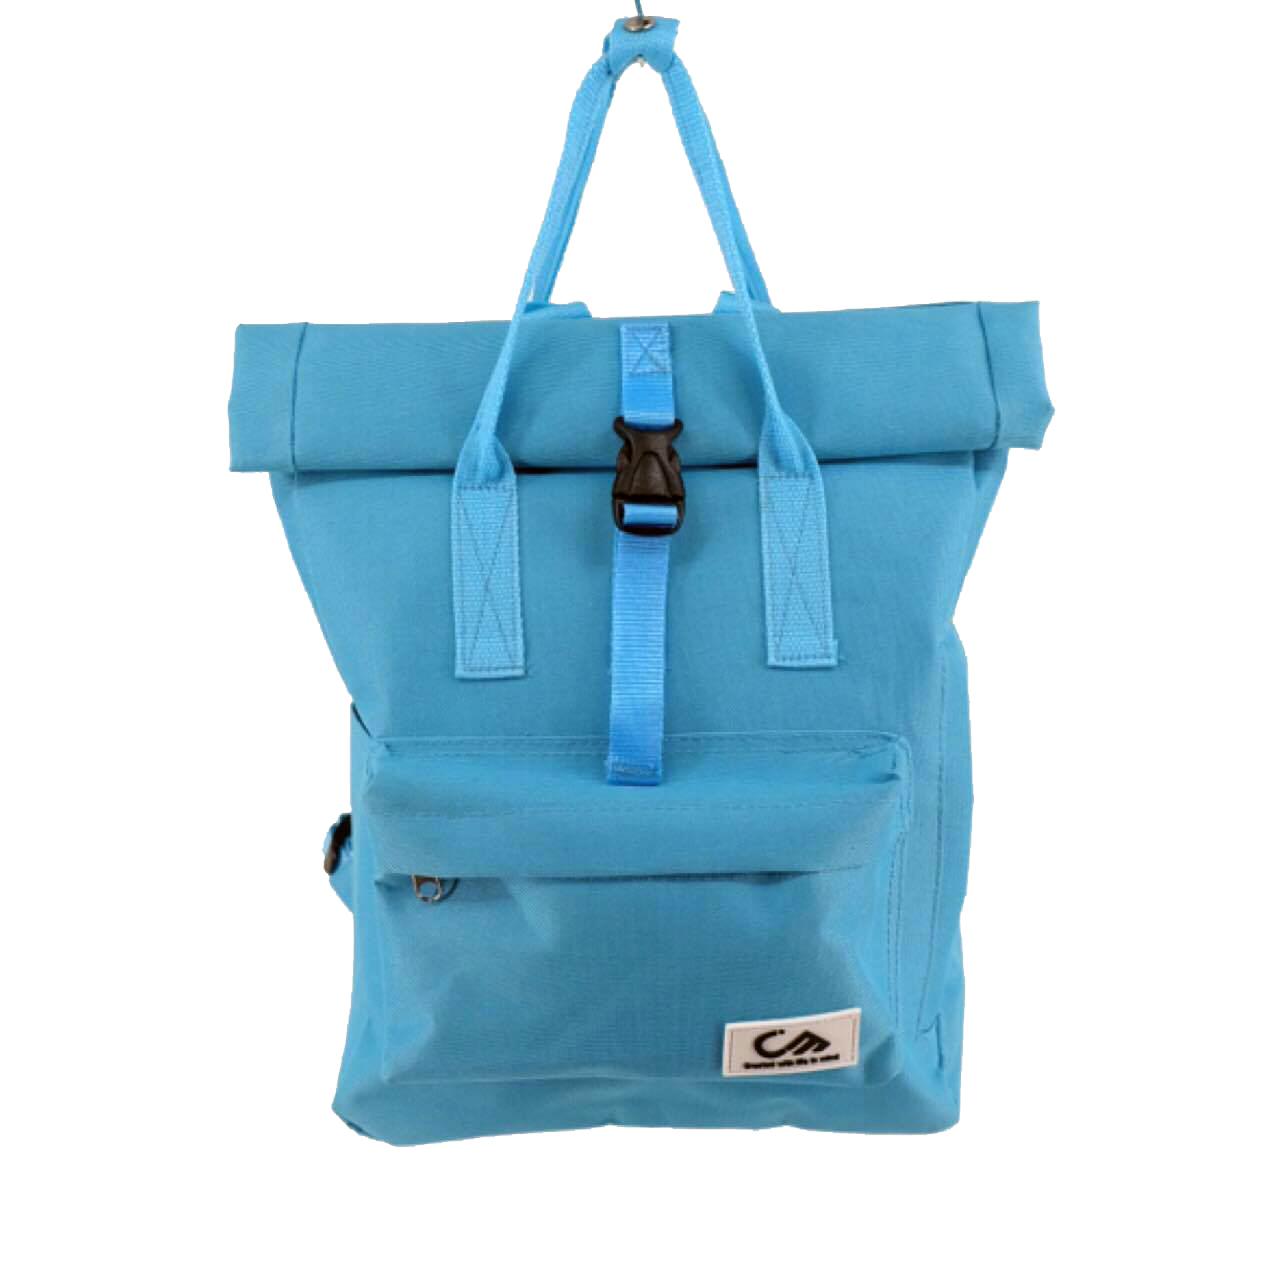 [L] Series II: Aqua Blue